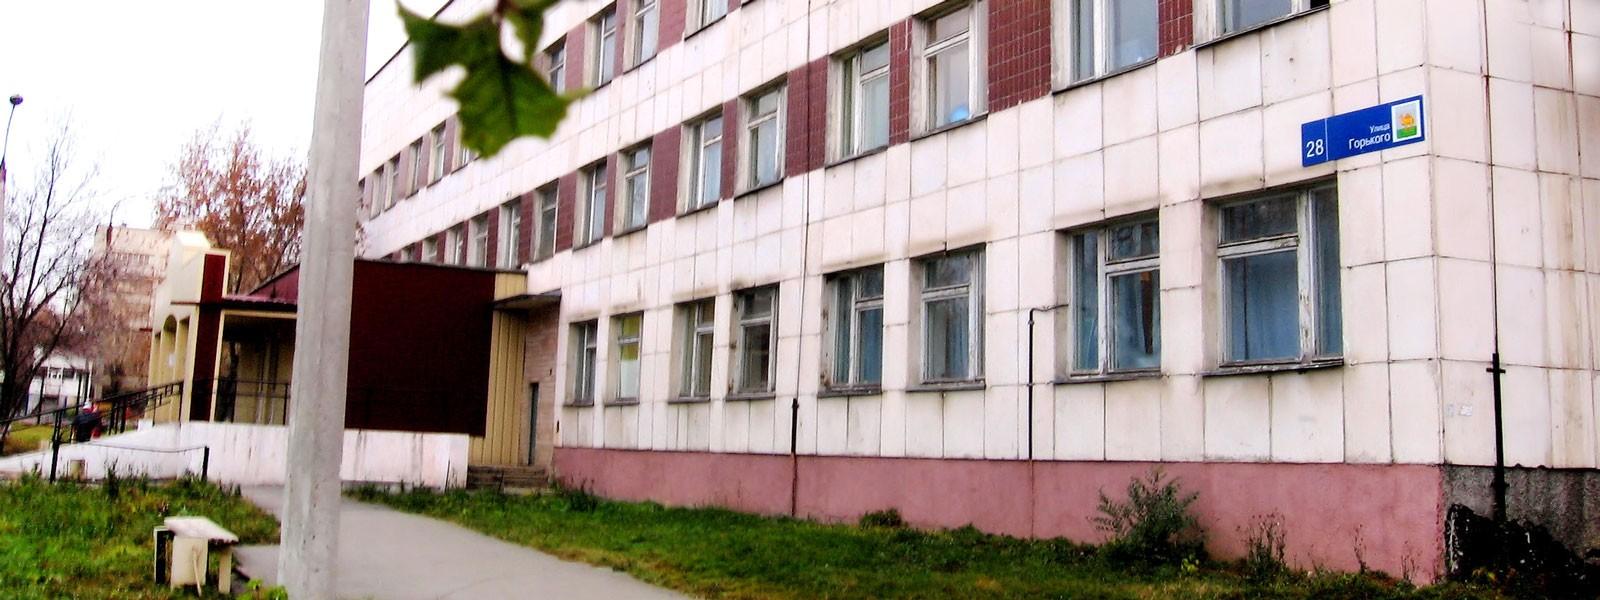 Медицинский центр днк клиника ярославль